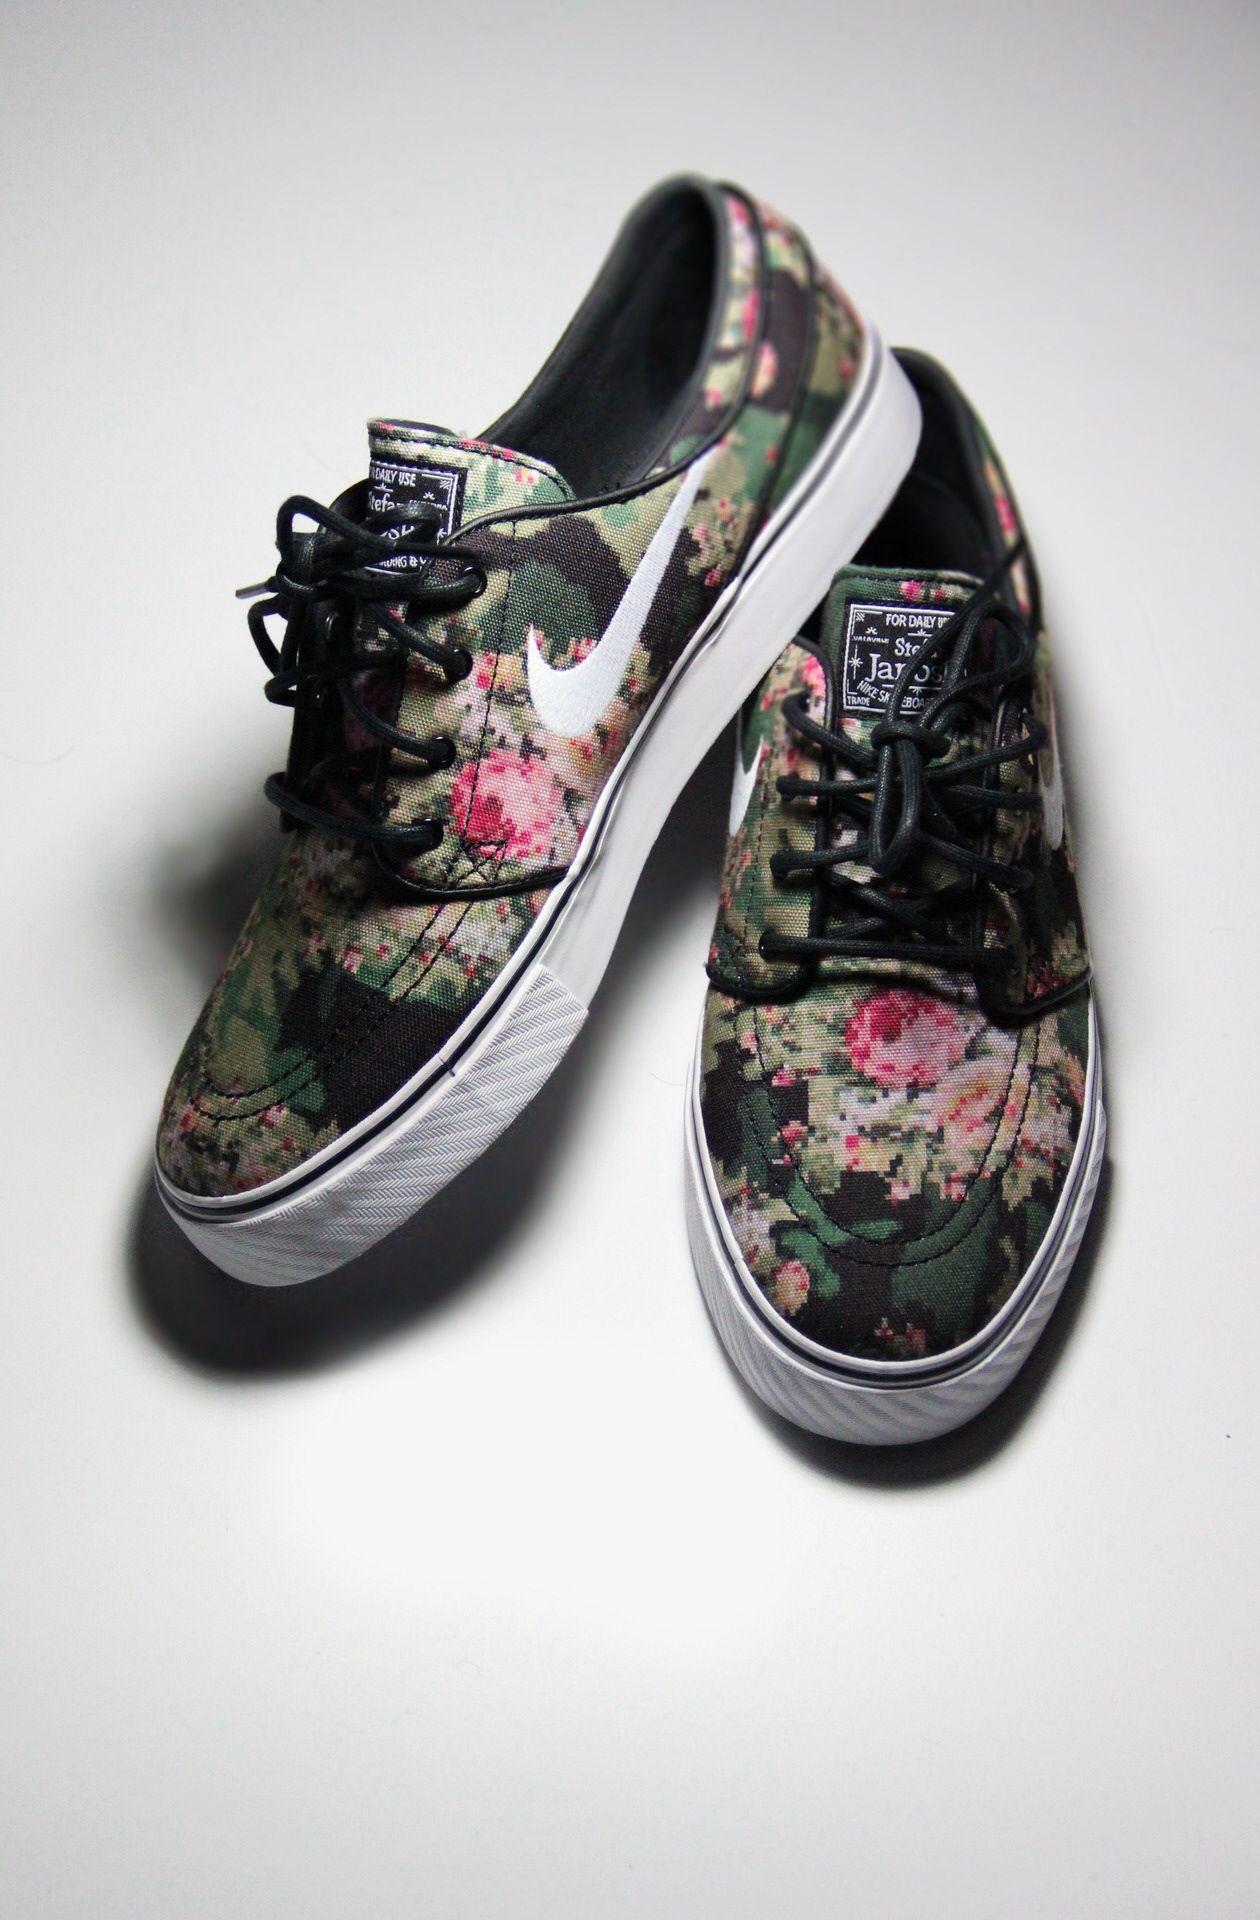 damenMännerschuhe floralSchuhe Nike SB Janoski Stefan 2WDHIE9